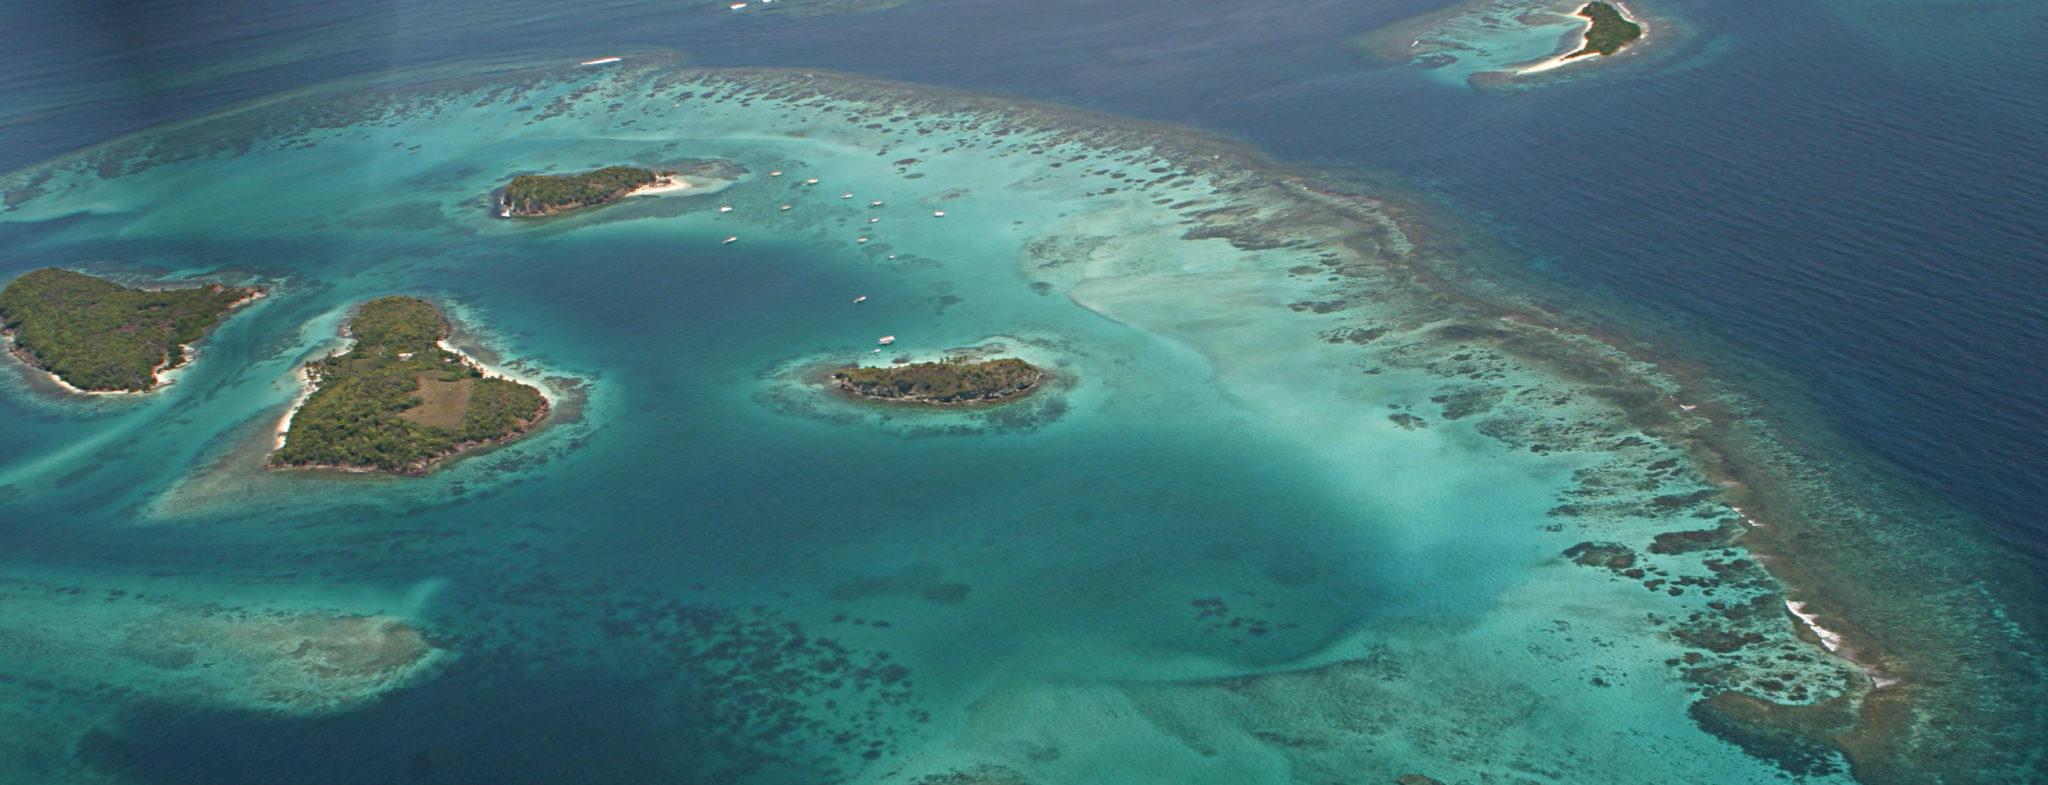 Tobago Cays in The Grenadines Caribbean